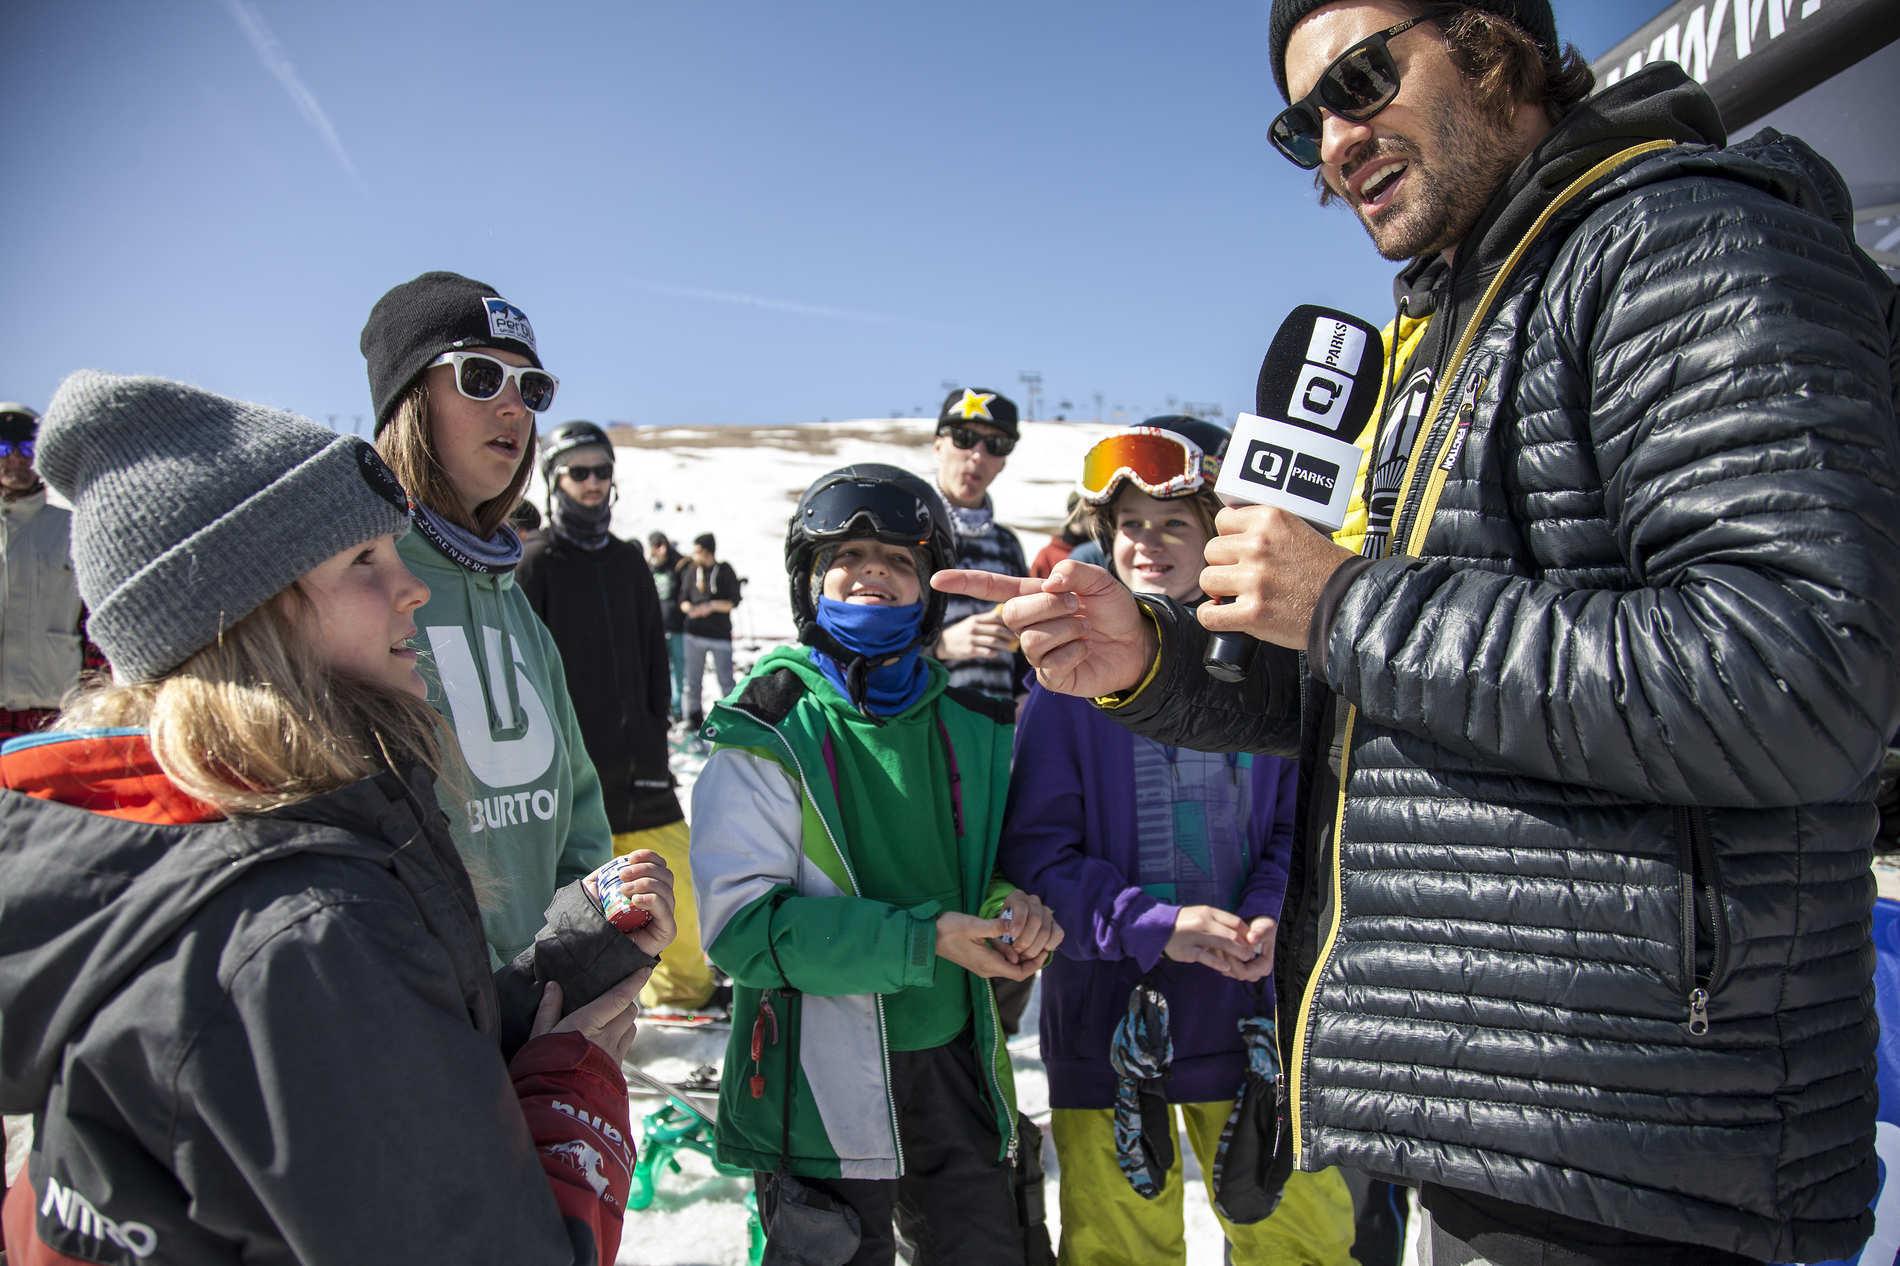 web snowpark feldberg 25 03 2017 lifestyle fs sb martin herrmann qparks 34